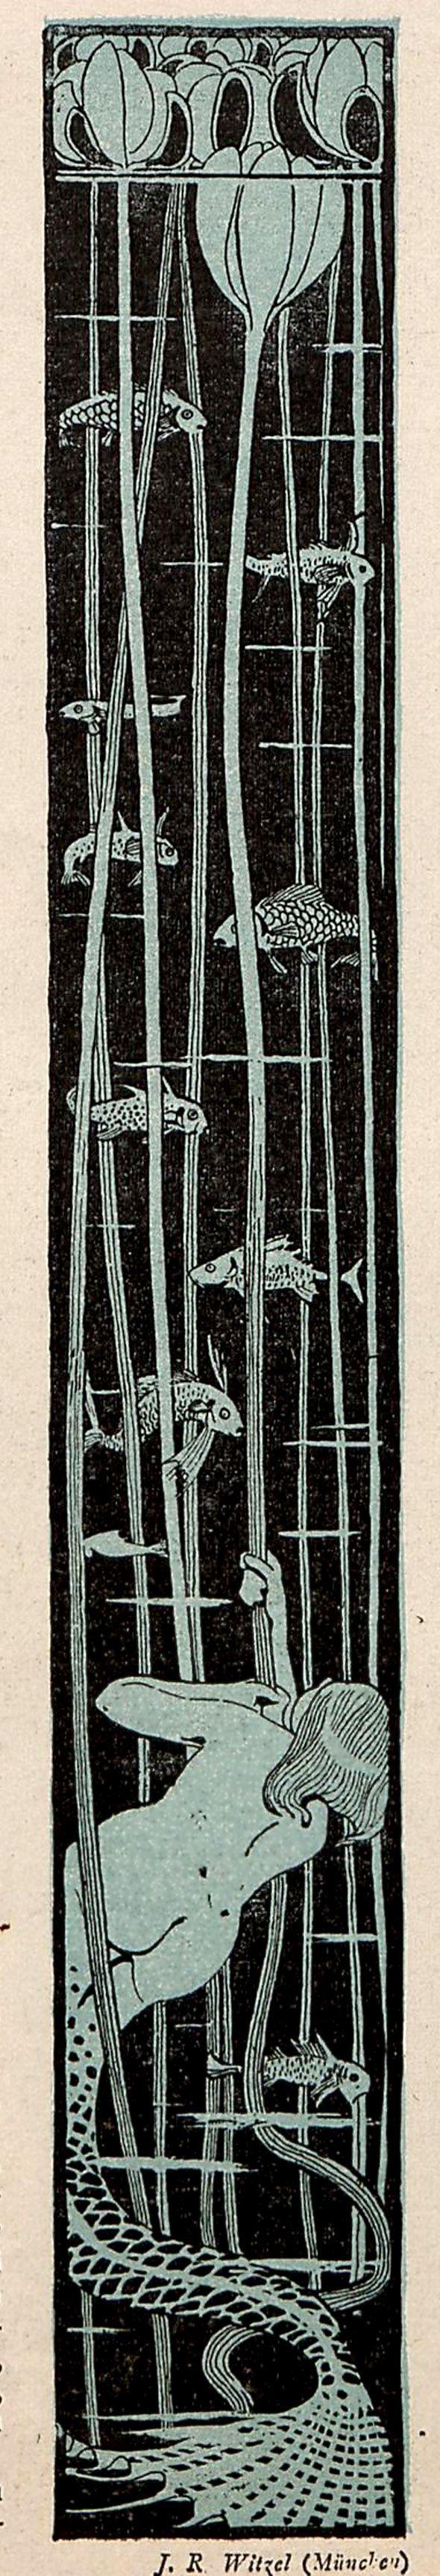 Freshwater nymph. J.R. Witzel, Jugend magazine, 1897